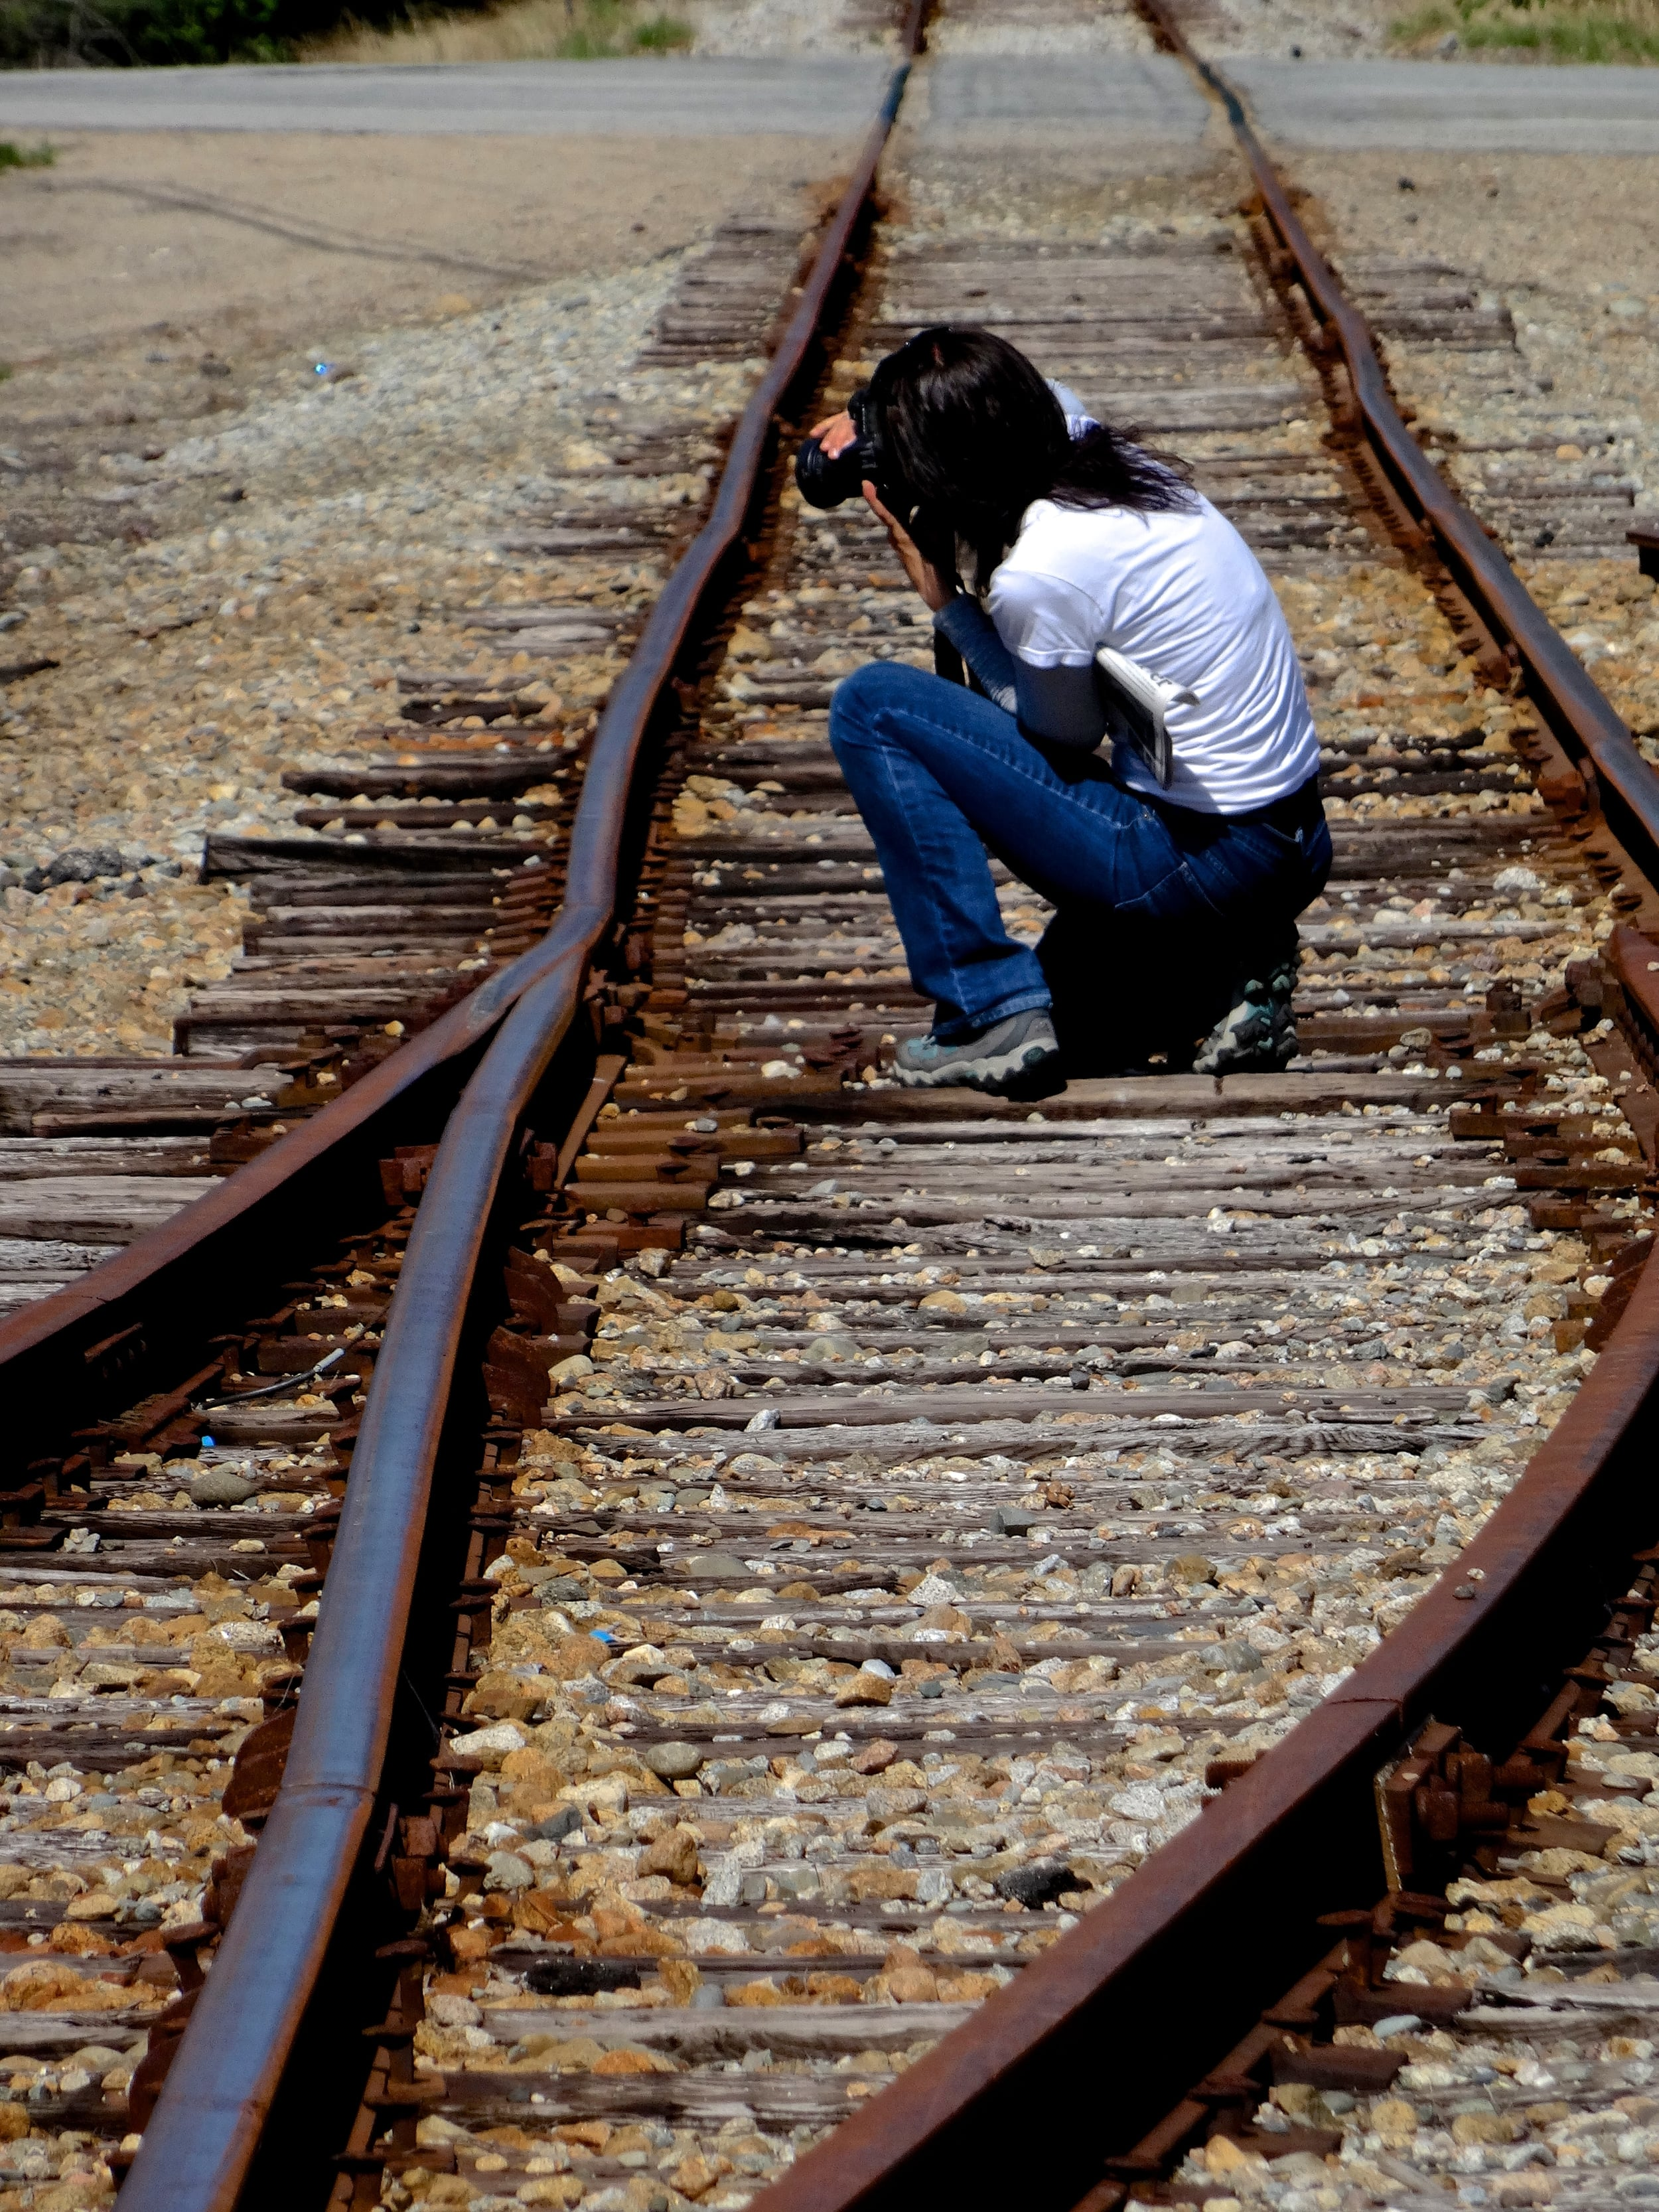 railroad-tracks-camera-june7_2015.jpg